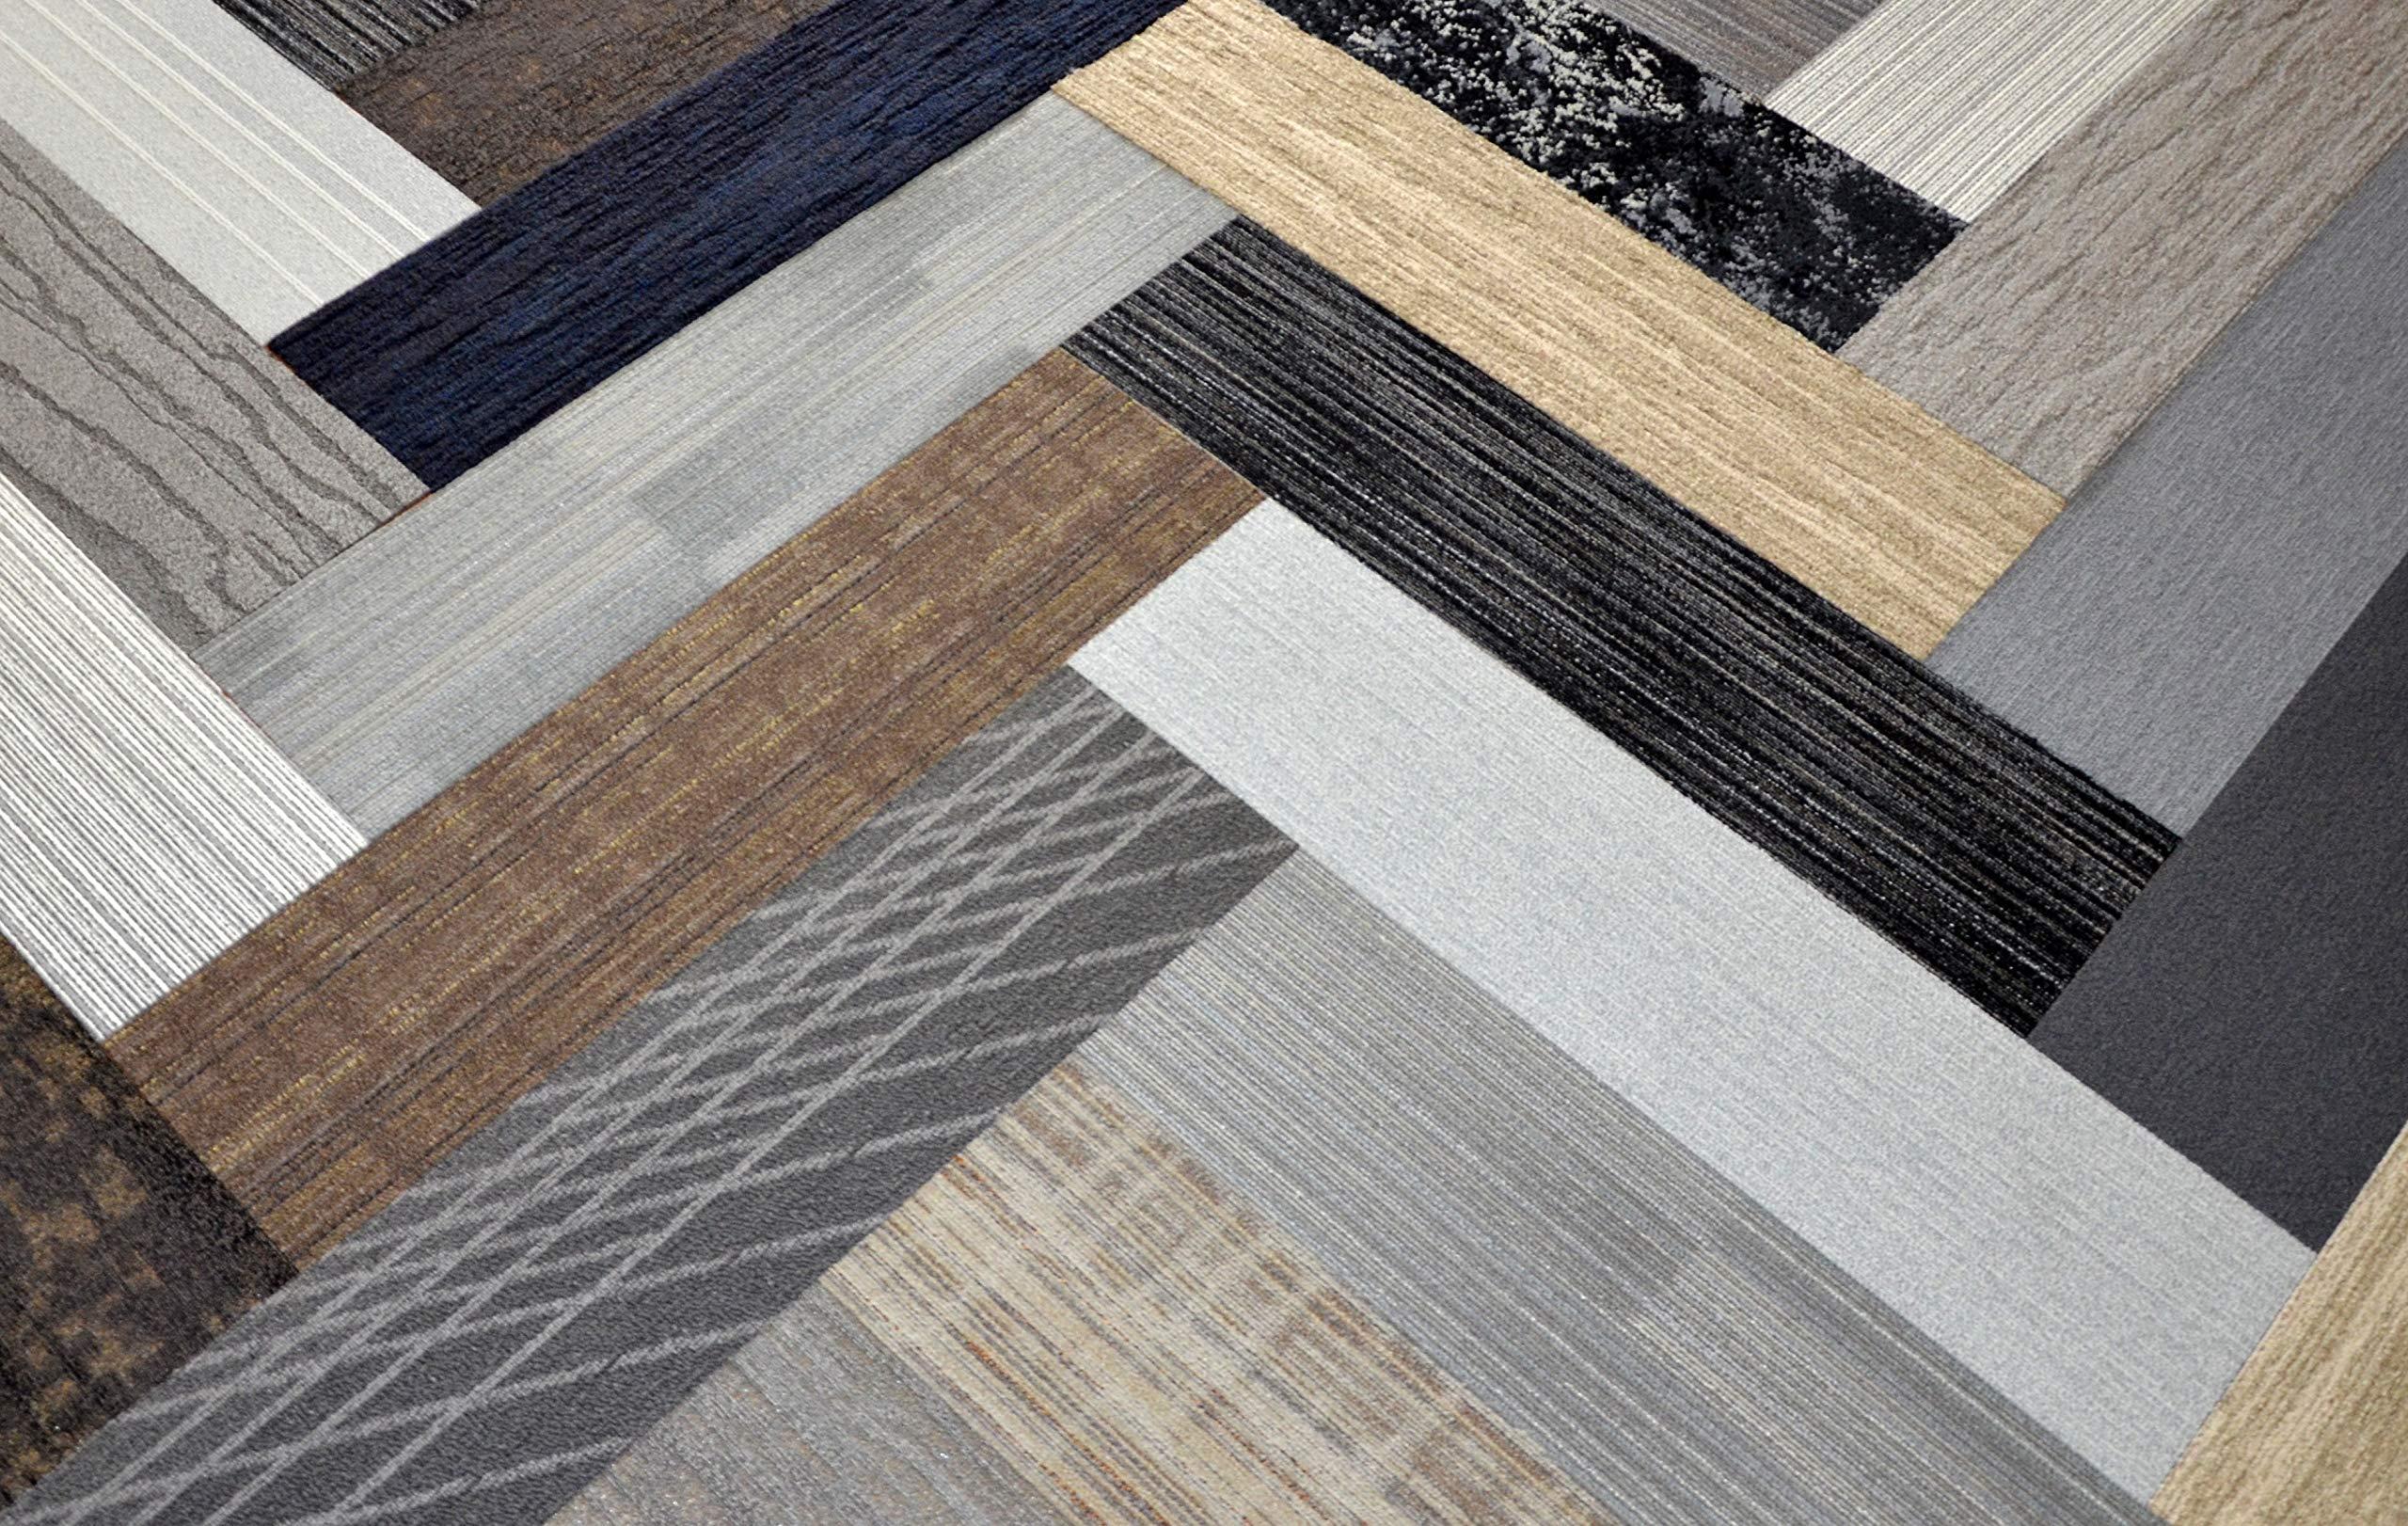 Dean Affordable 48'' x 12'' Plank Commercial Carpet Tile - Random Assorted Colors - 48 Square Feet (12 Pieces)